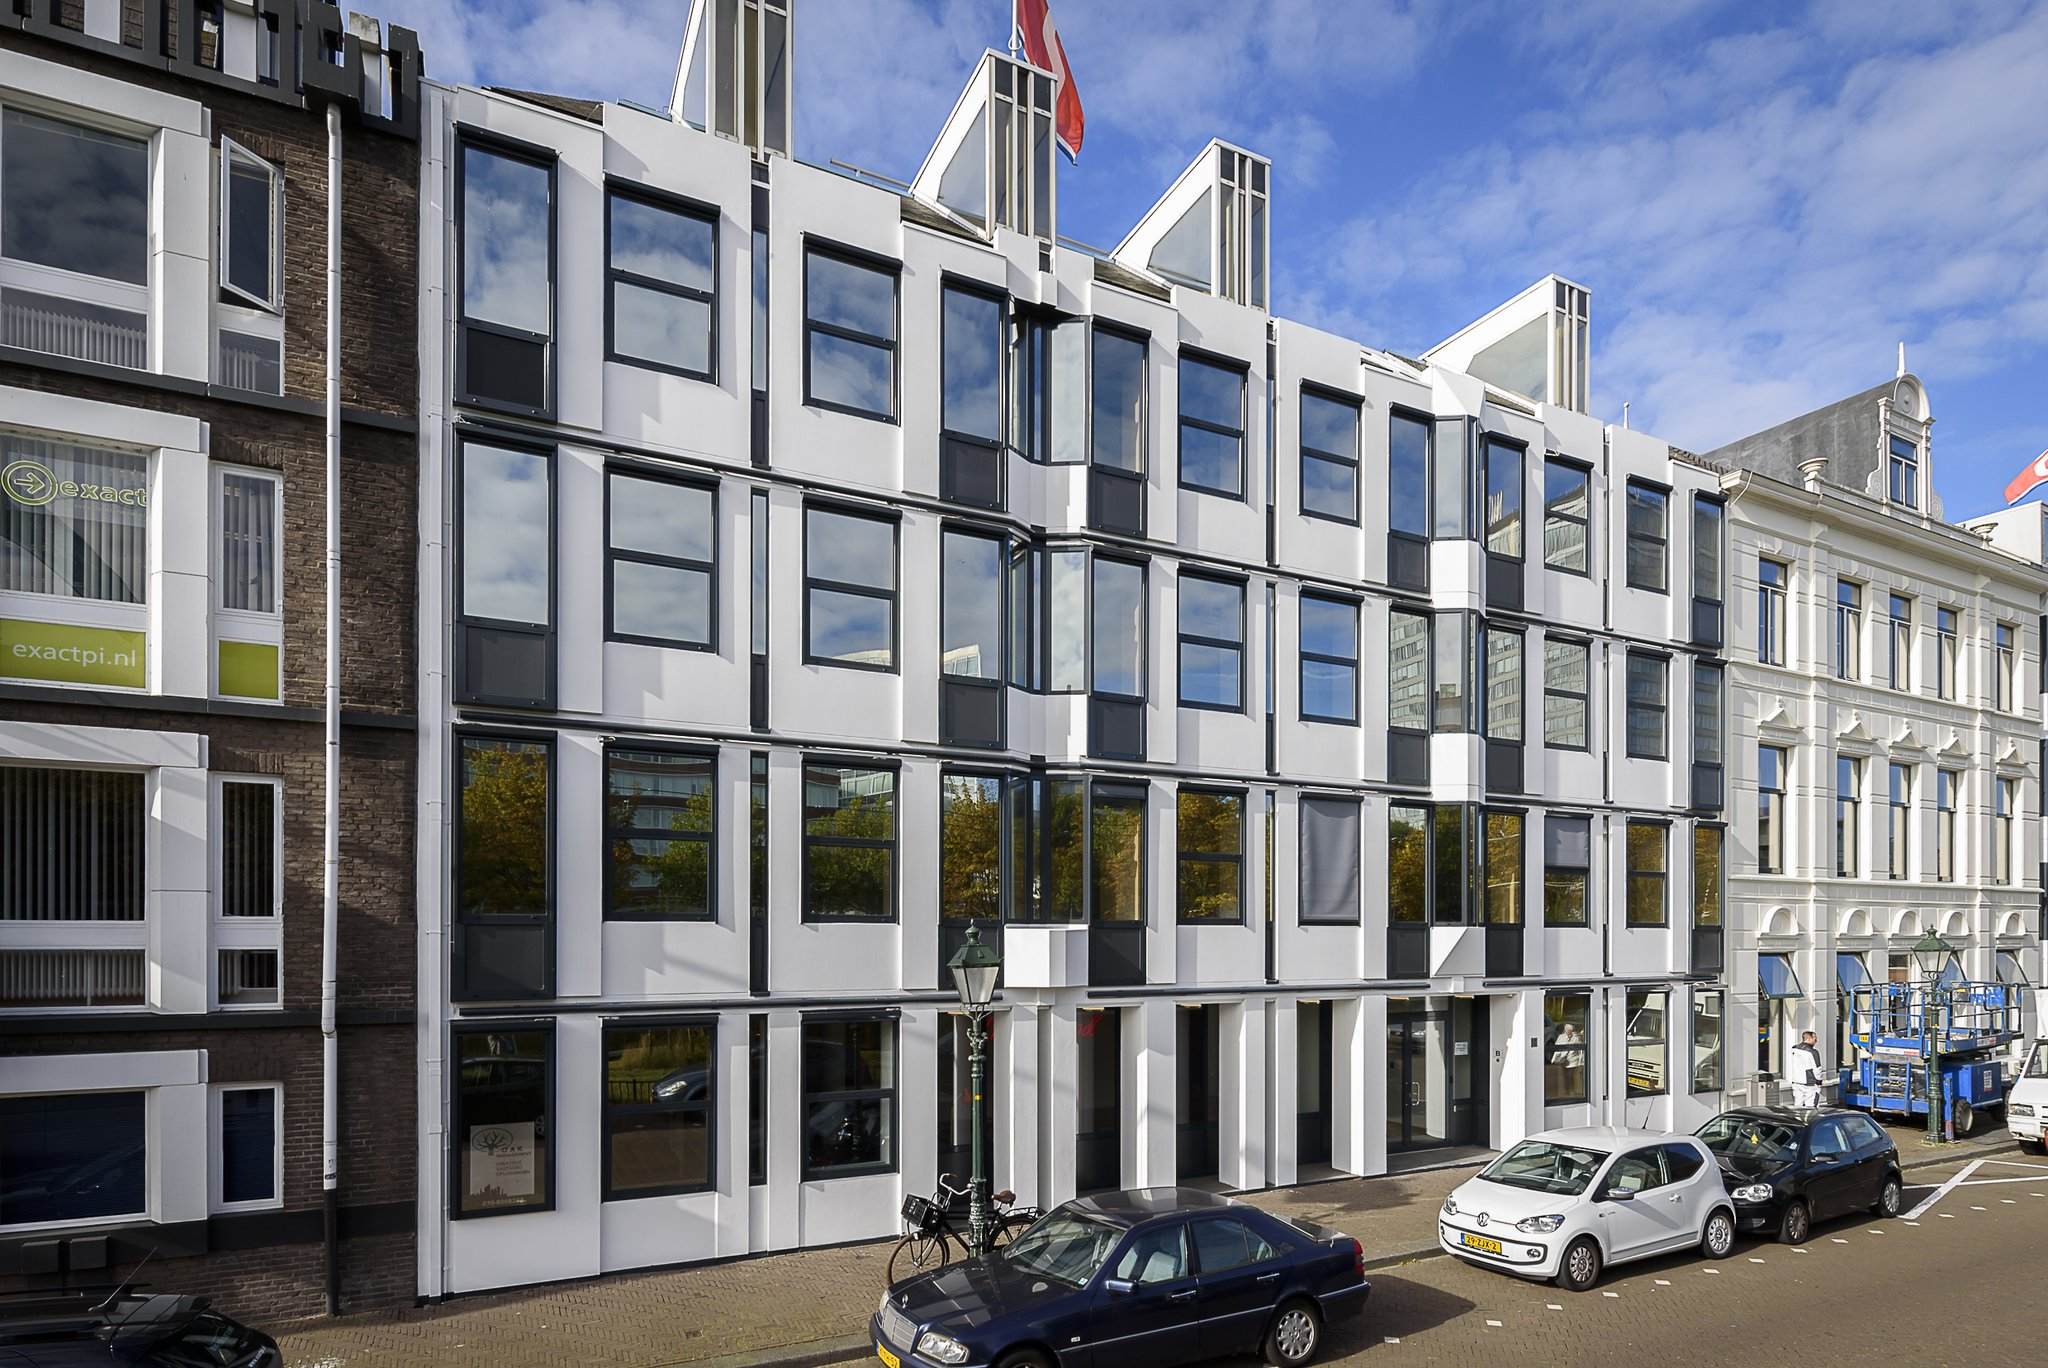 StadsKliniek Den Haag